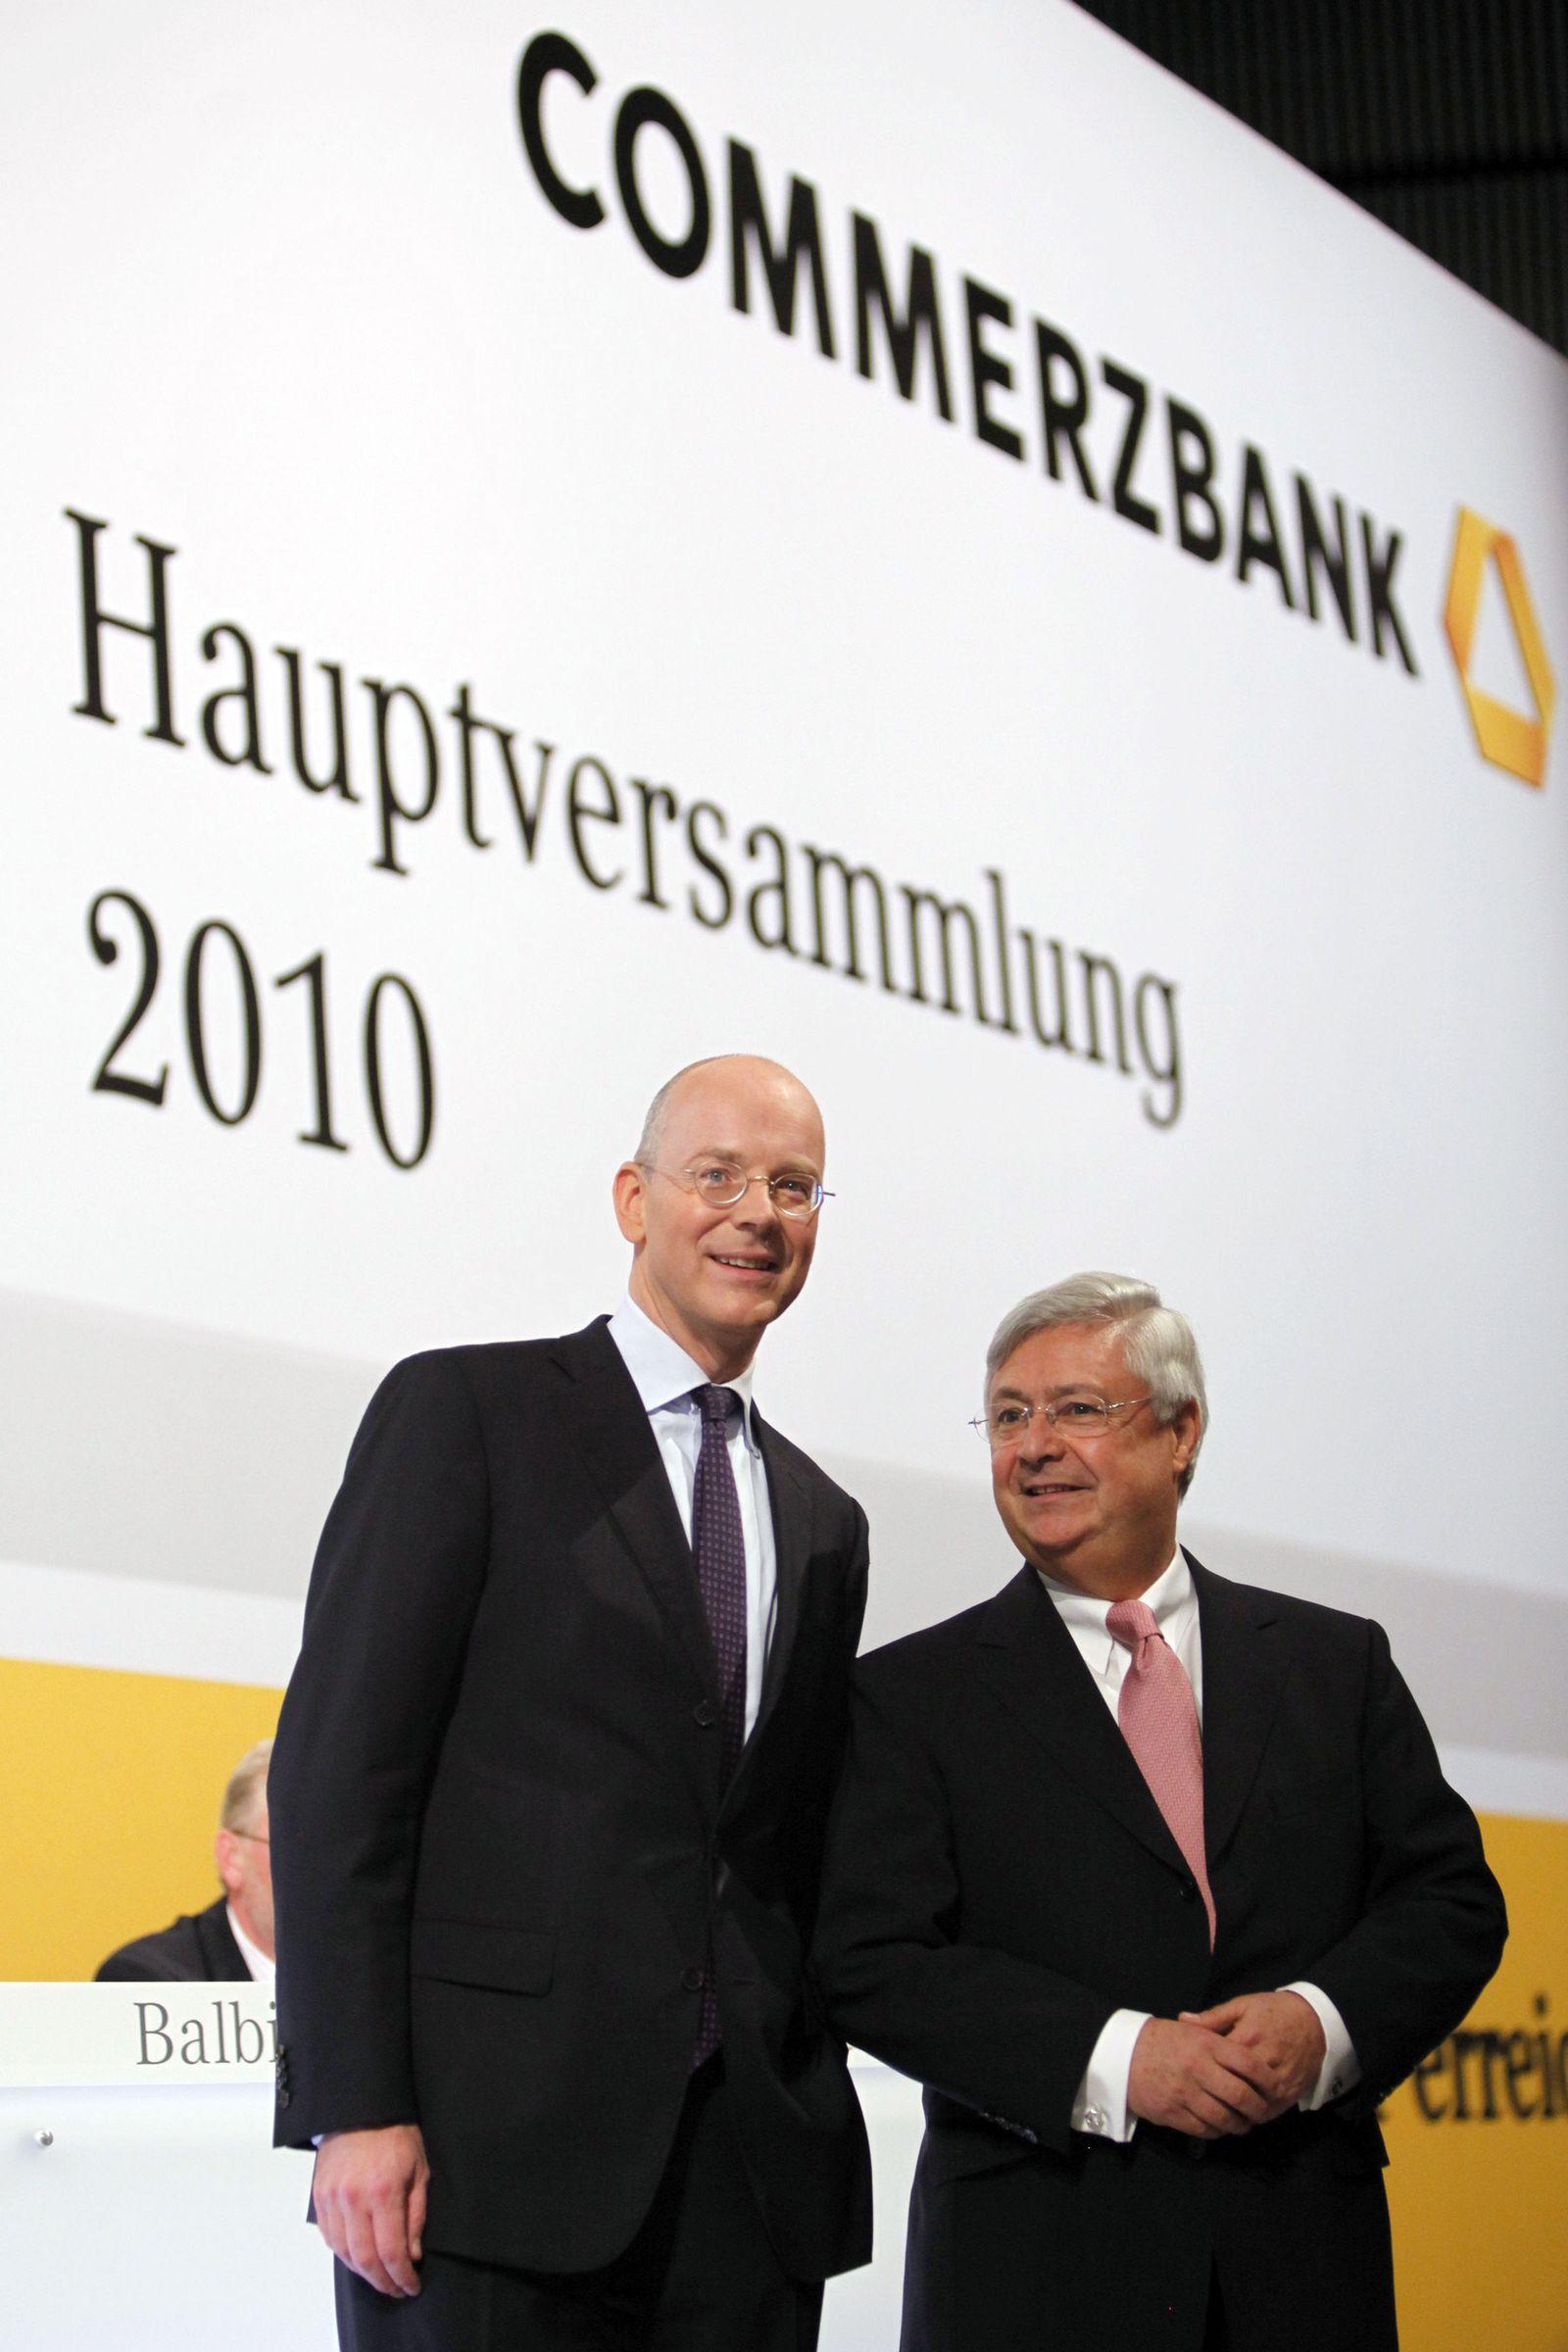 Commerzbank Hauptversammlung